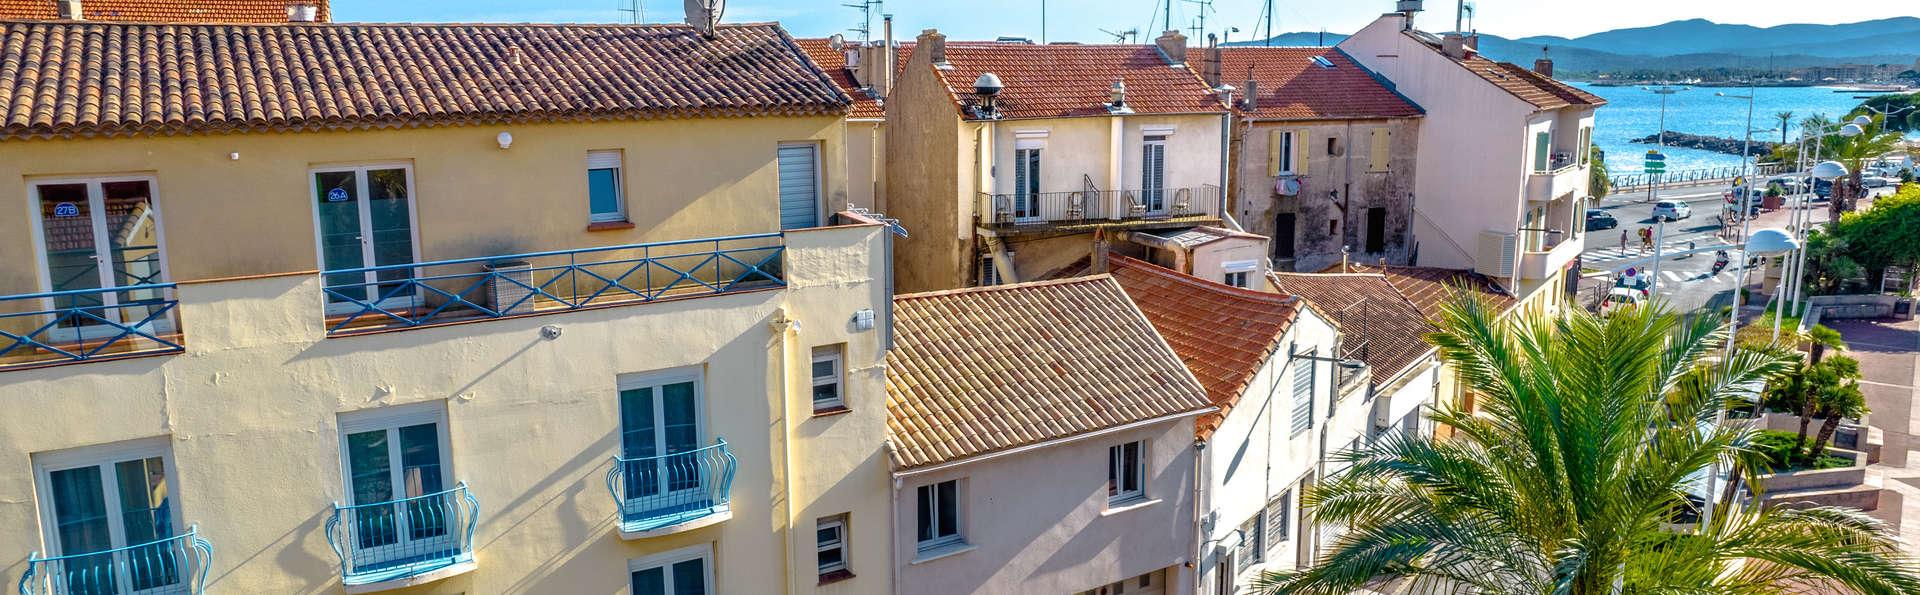 Hôtel Provençal - 11_le_provencal.jpg